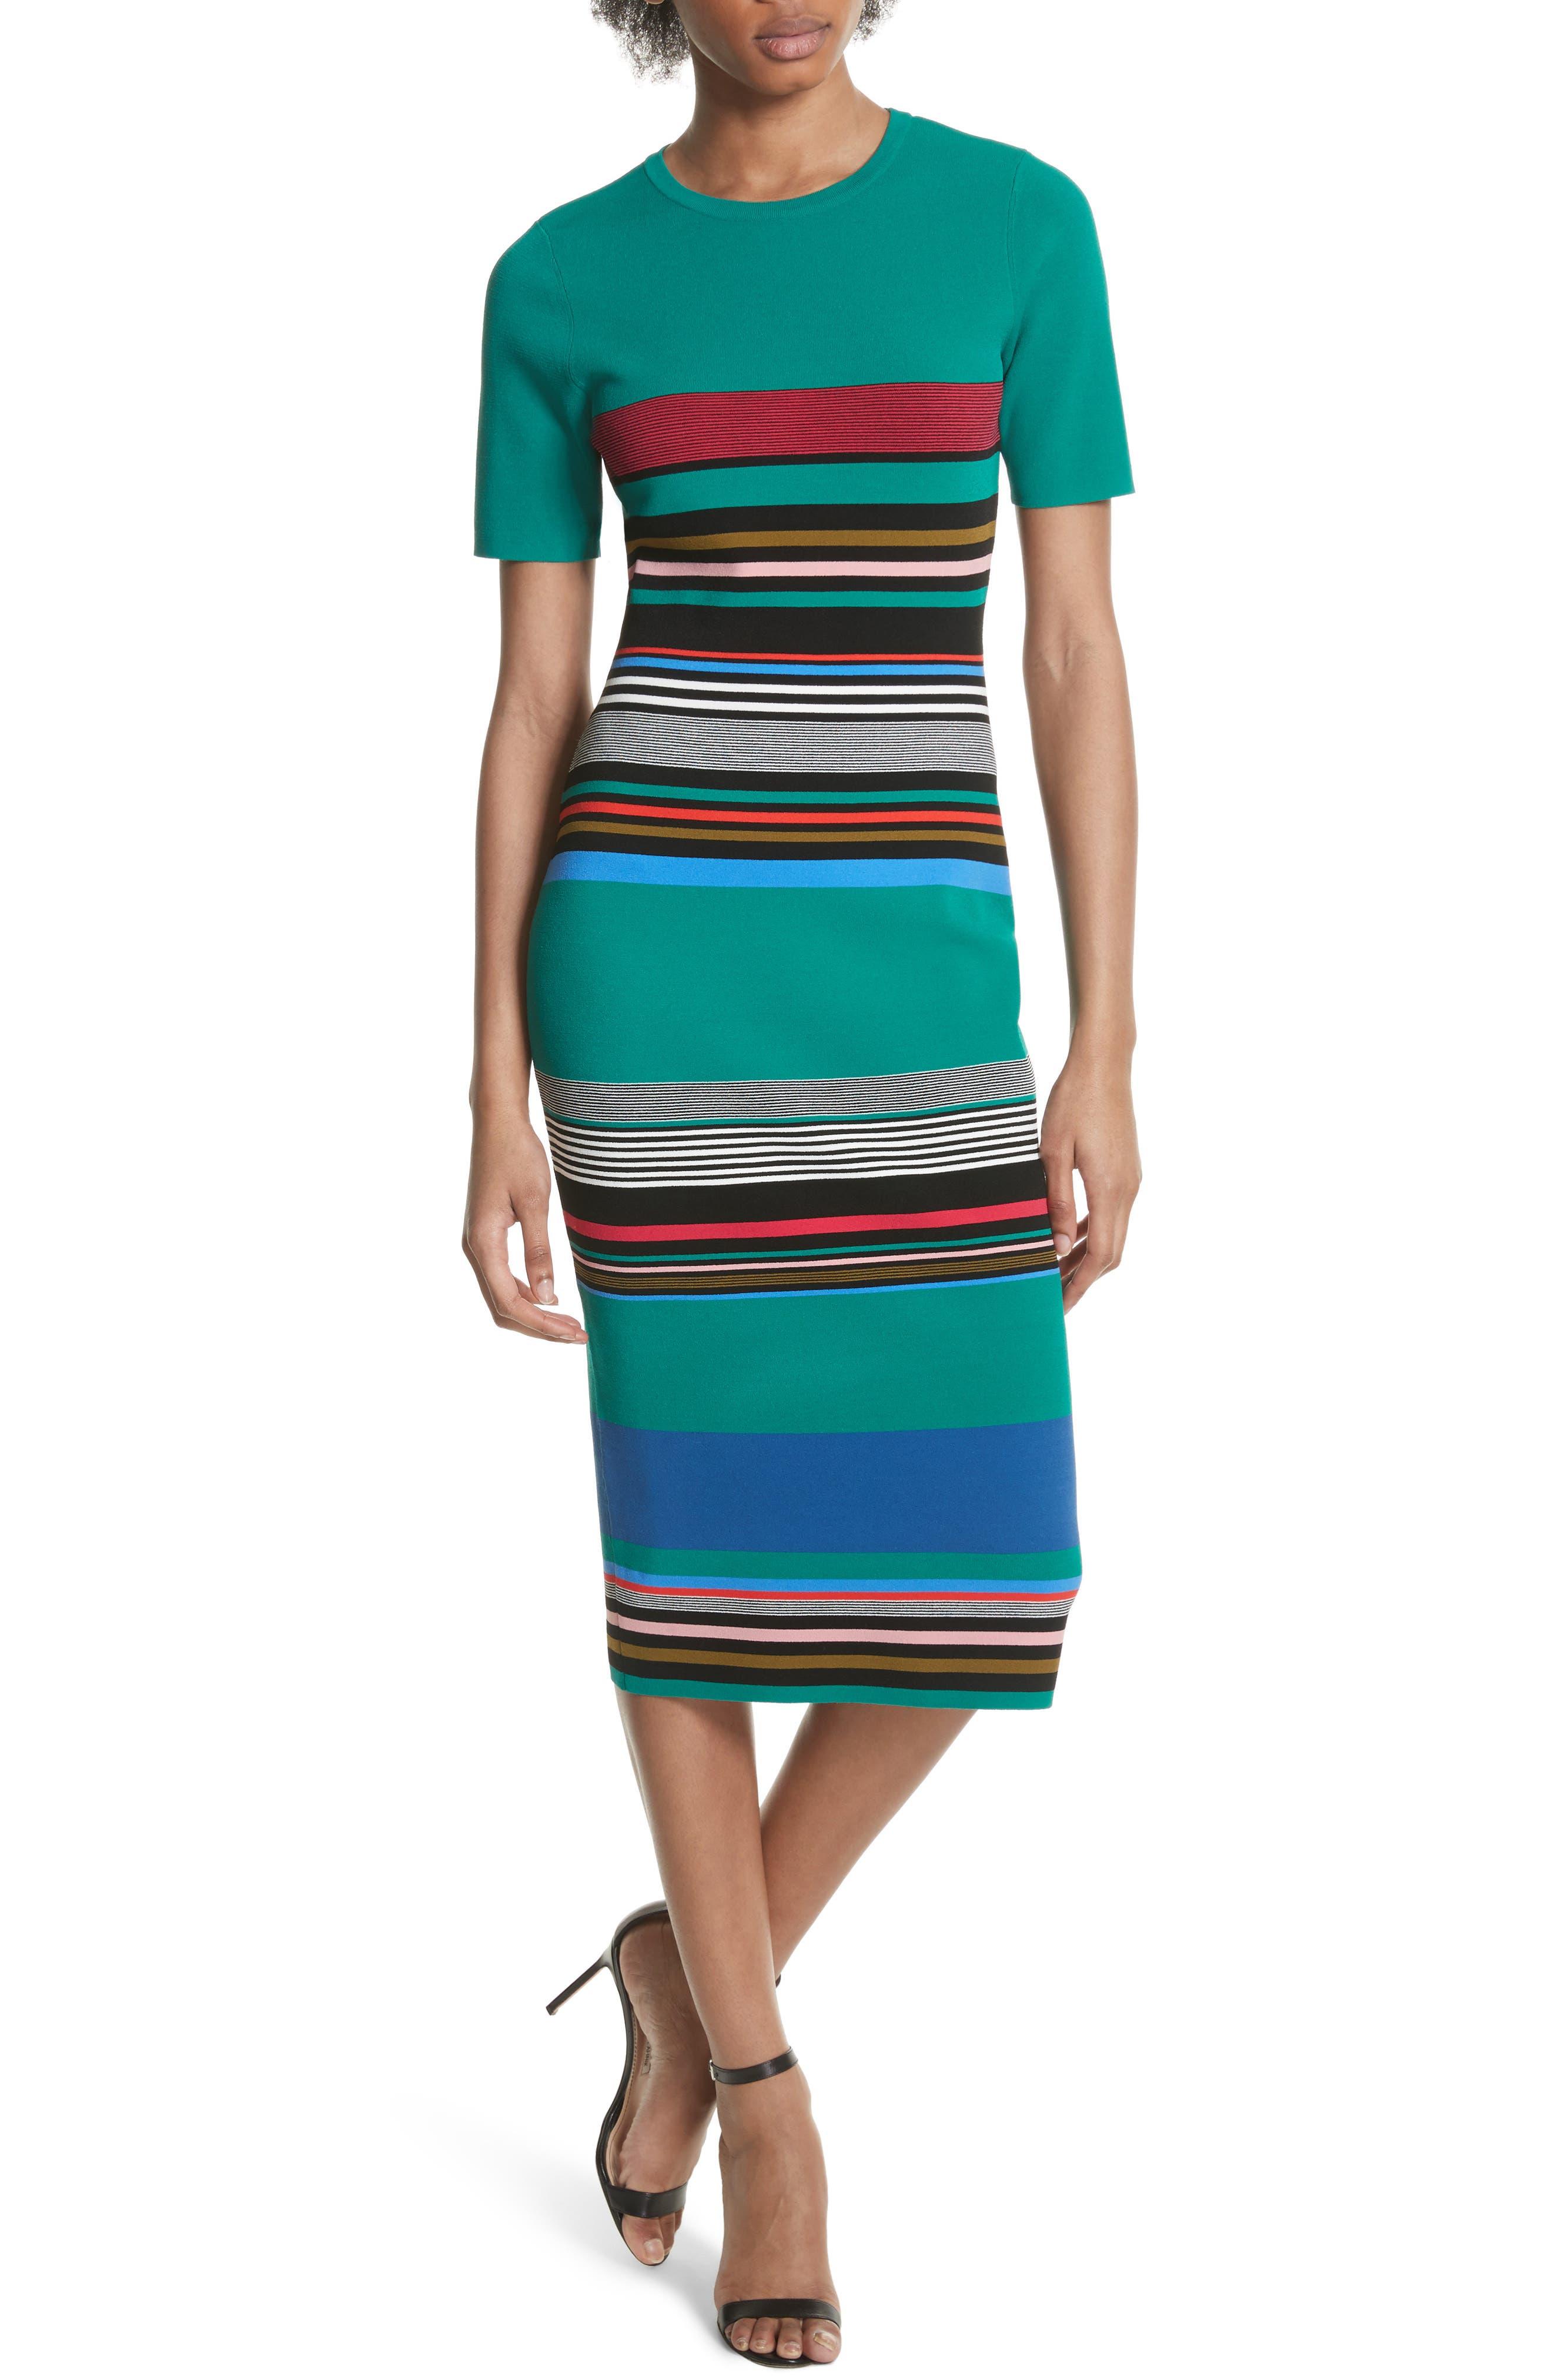 Diane von Furstenberg Stripe Short Sleeve Sweater Dress,                             Main thumbnail 1, color,                             Juniper Multi